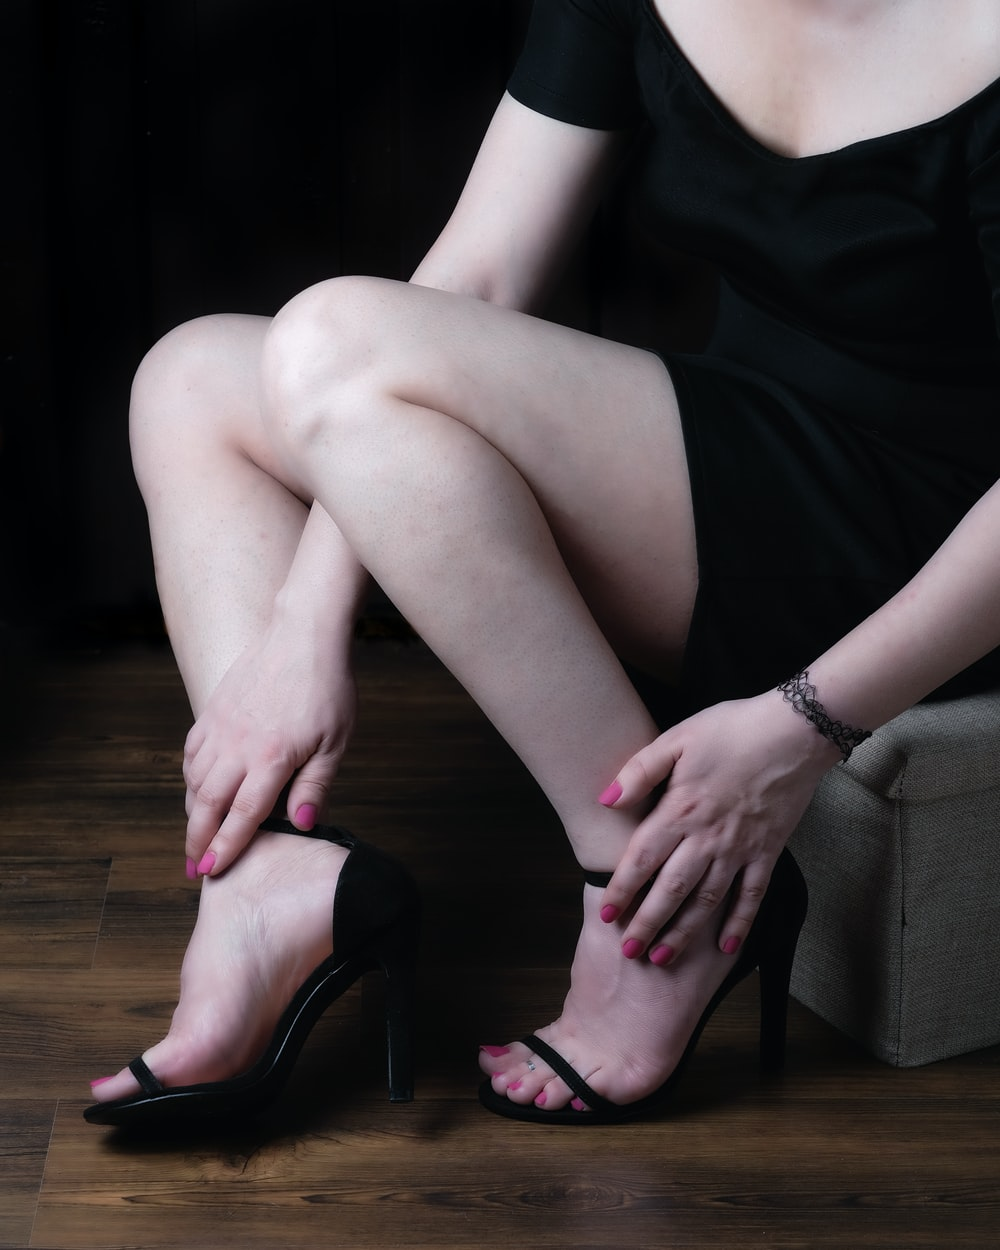 woman in black dress sitting on gray sofa